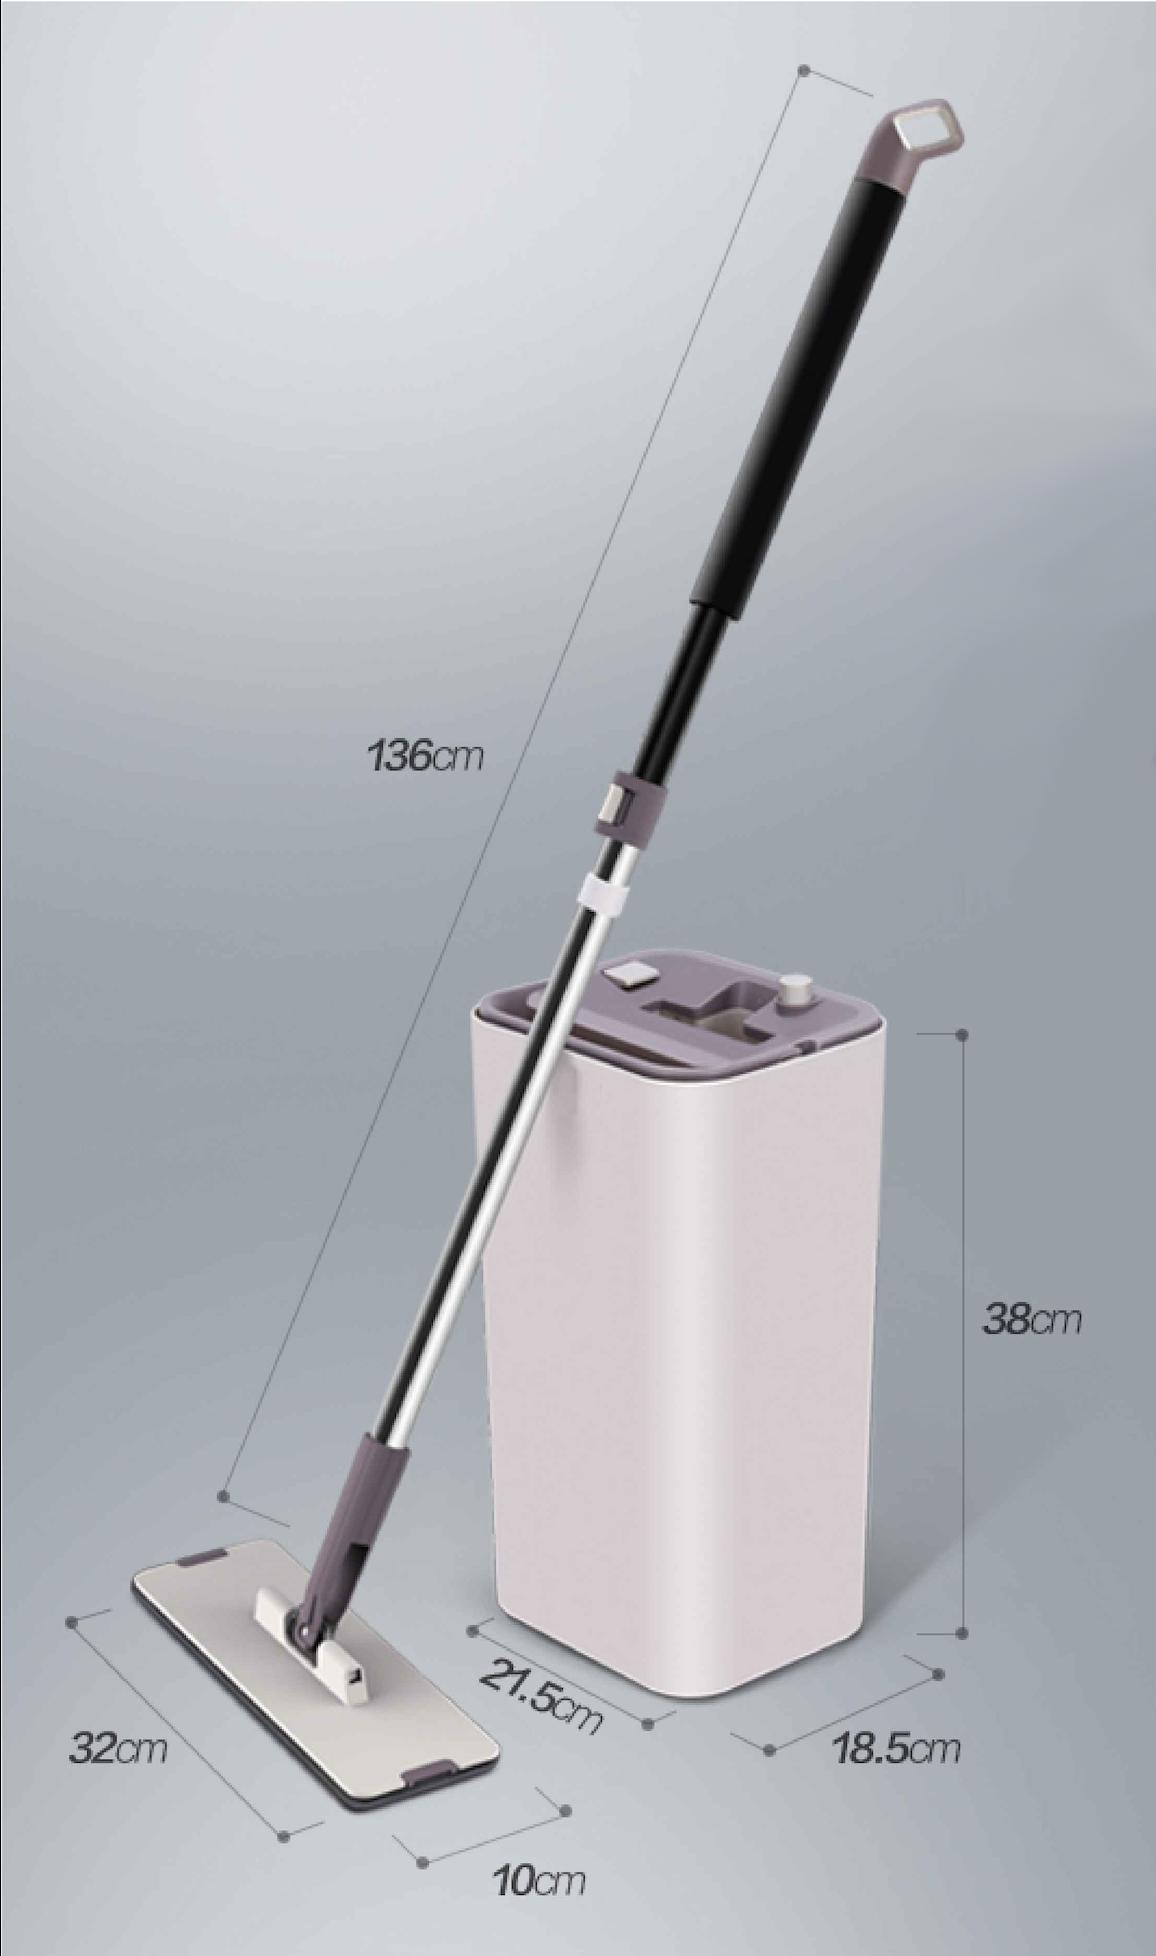 Scopa Flat mop per la pulizia di casa